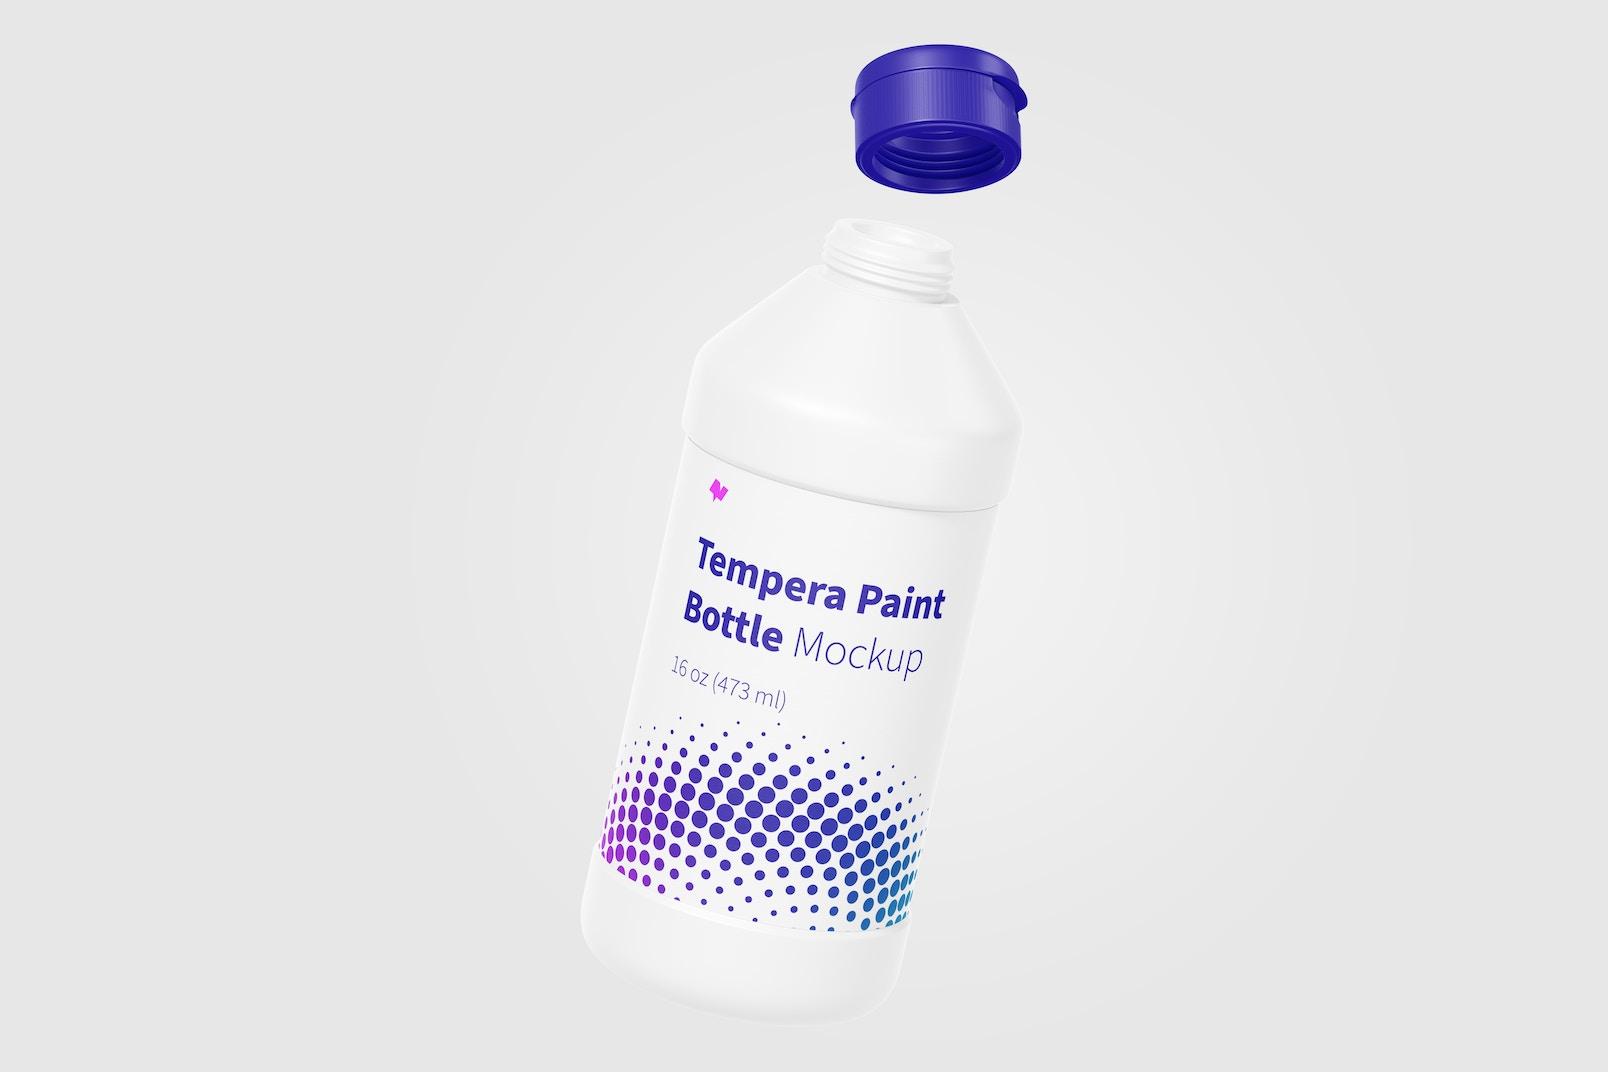 16 oz Tempera Paint Bottle Mockup, Floating